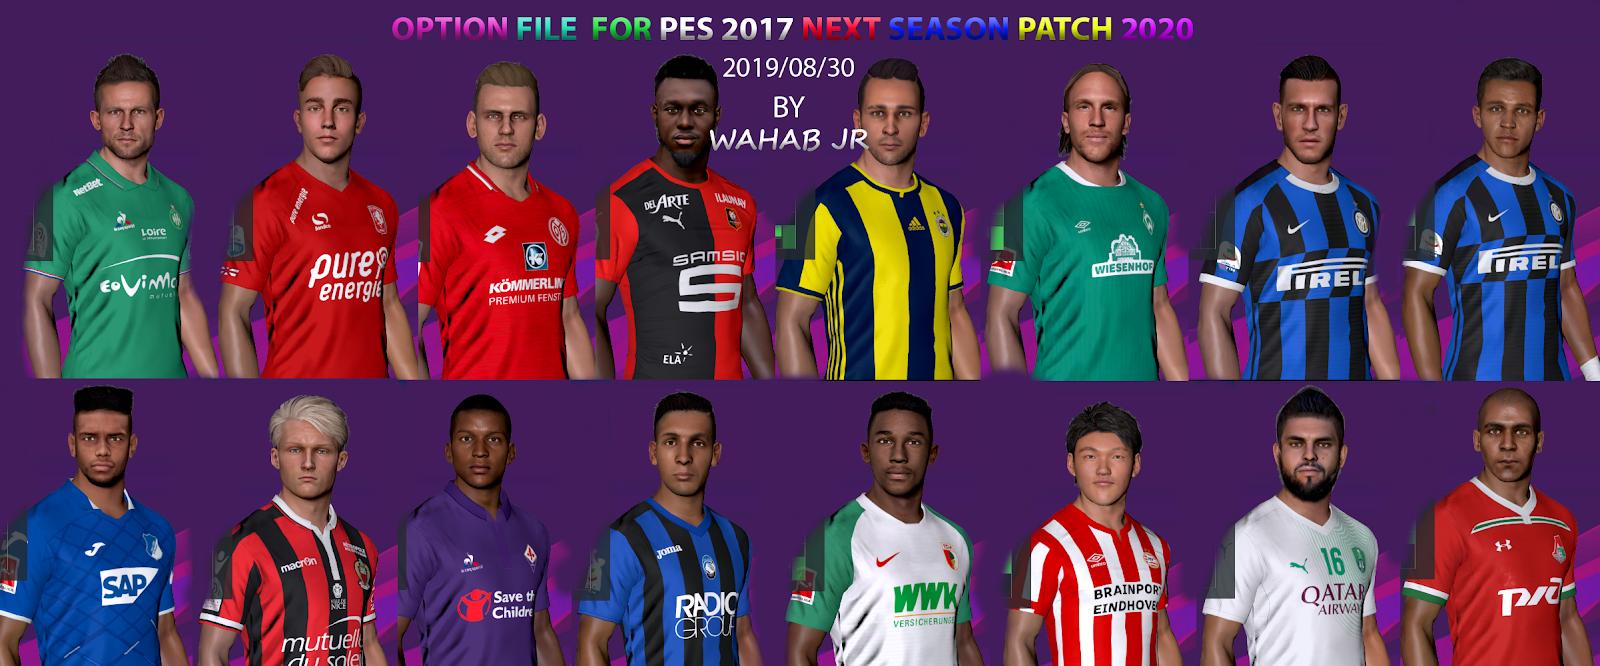 PES 2017 Next Season Patch 2020 Option File 03/09/2019 by